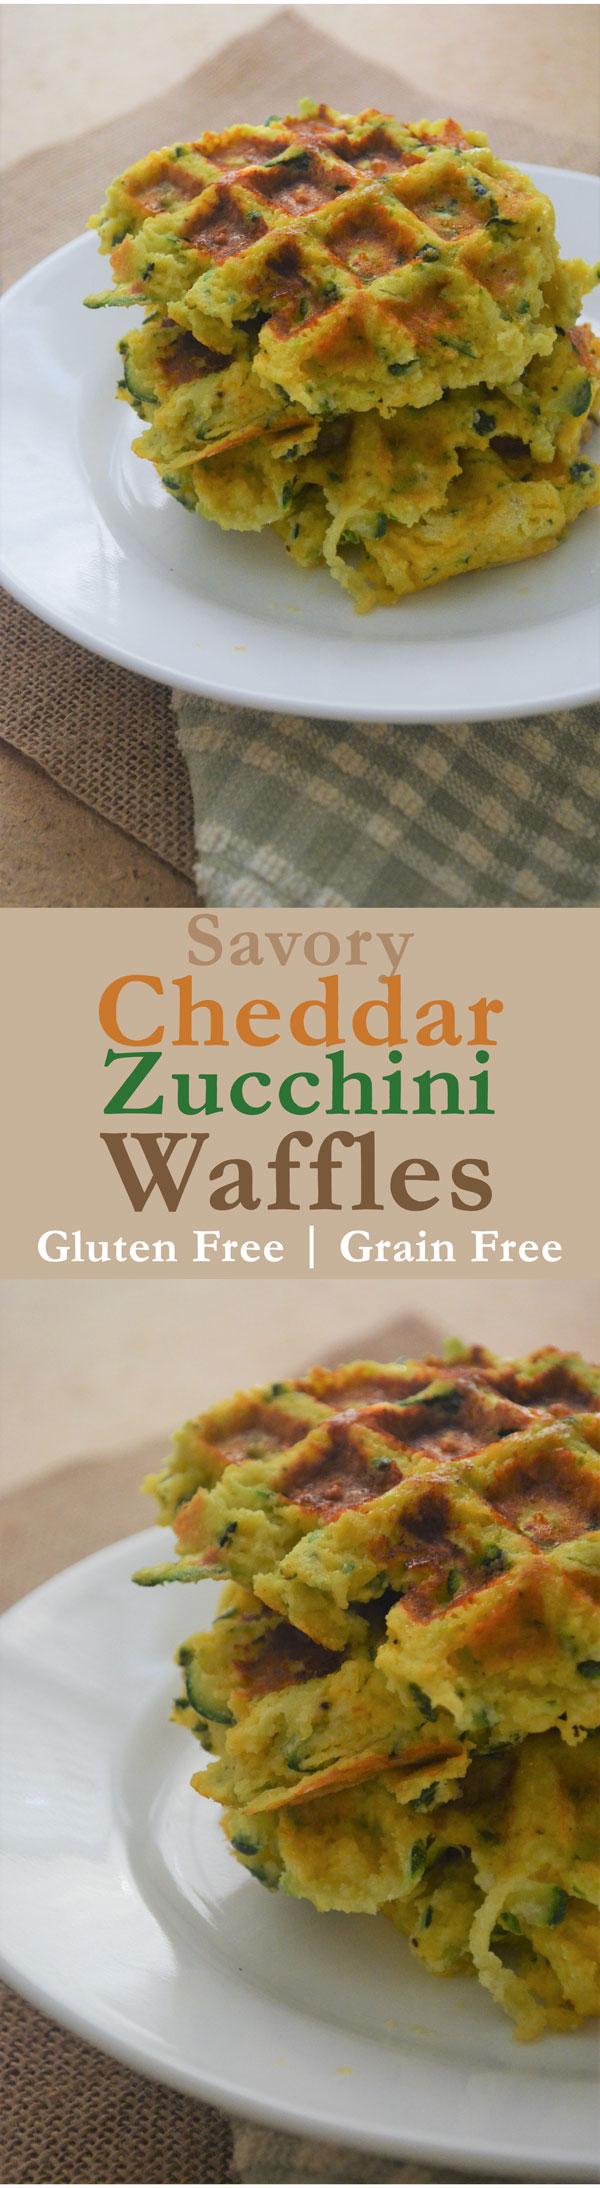 savory cheddar zucchini waffles gluten free grain free